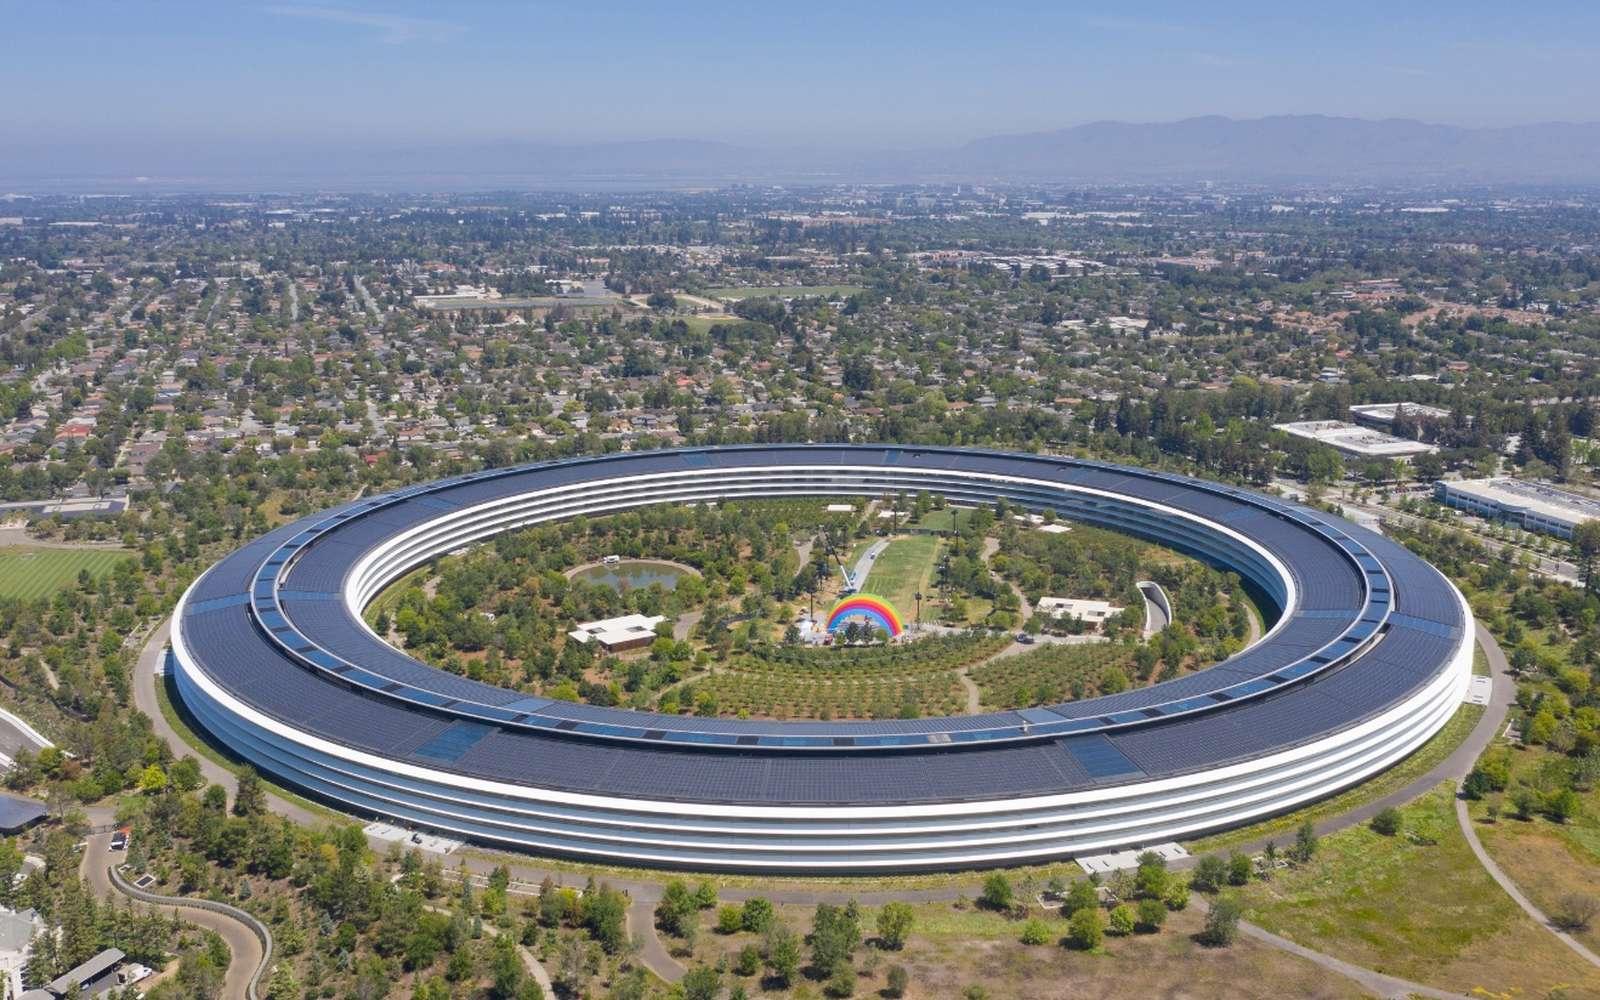 La maison mère d'Apple à Cupertino depuis avril 2017. © Arne Müseler, Wikimedia Commons, CC by-sa 3.0